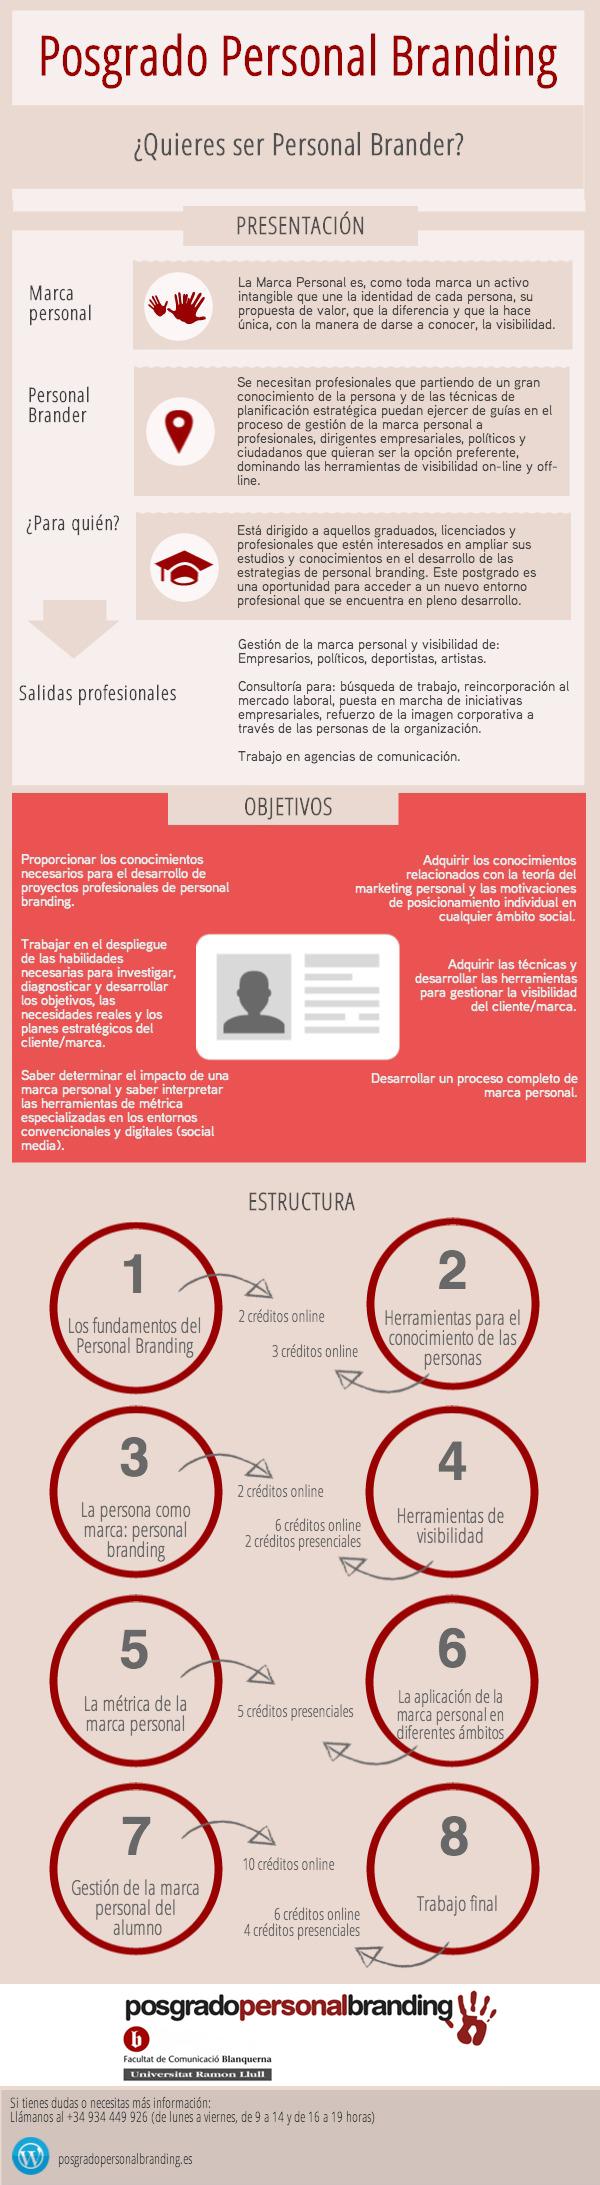 infografía posgrado personal branding / guillemrecolons.com